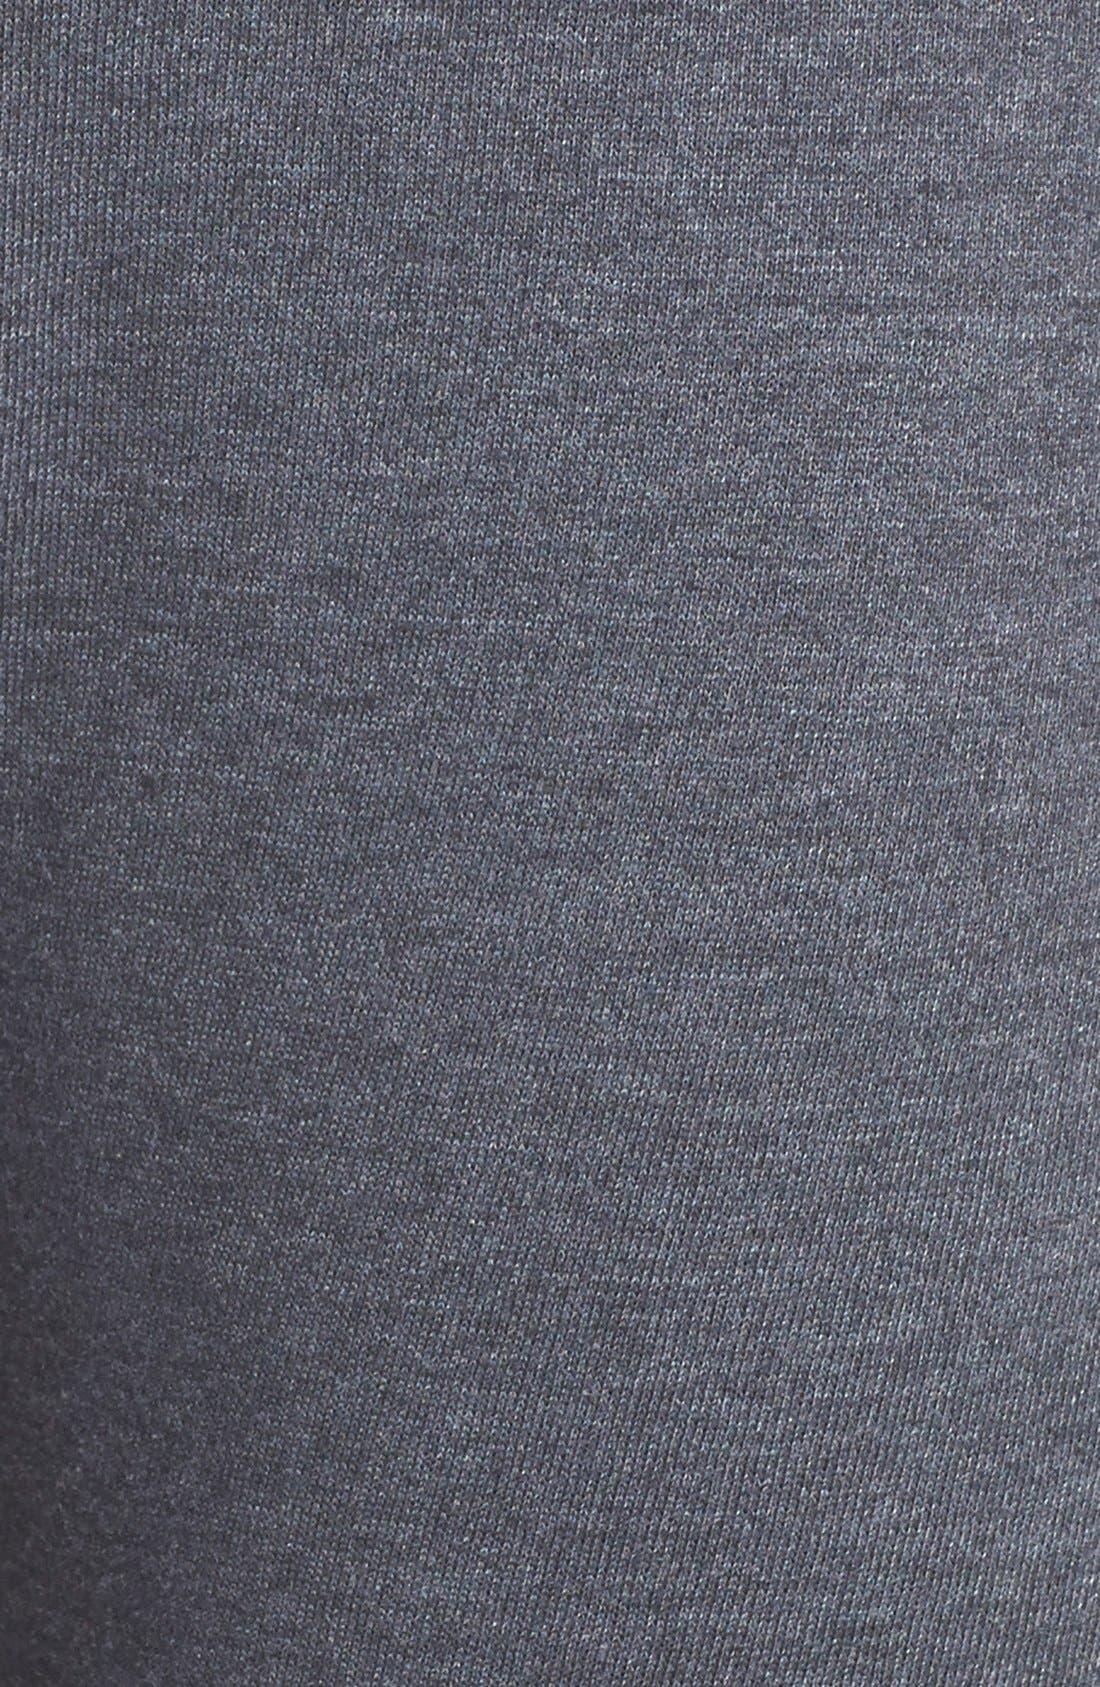 Alternate Image 4  - 35mm Clothing 'Molly' Zip Hem Jogger Pants